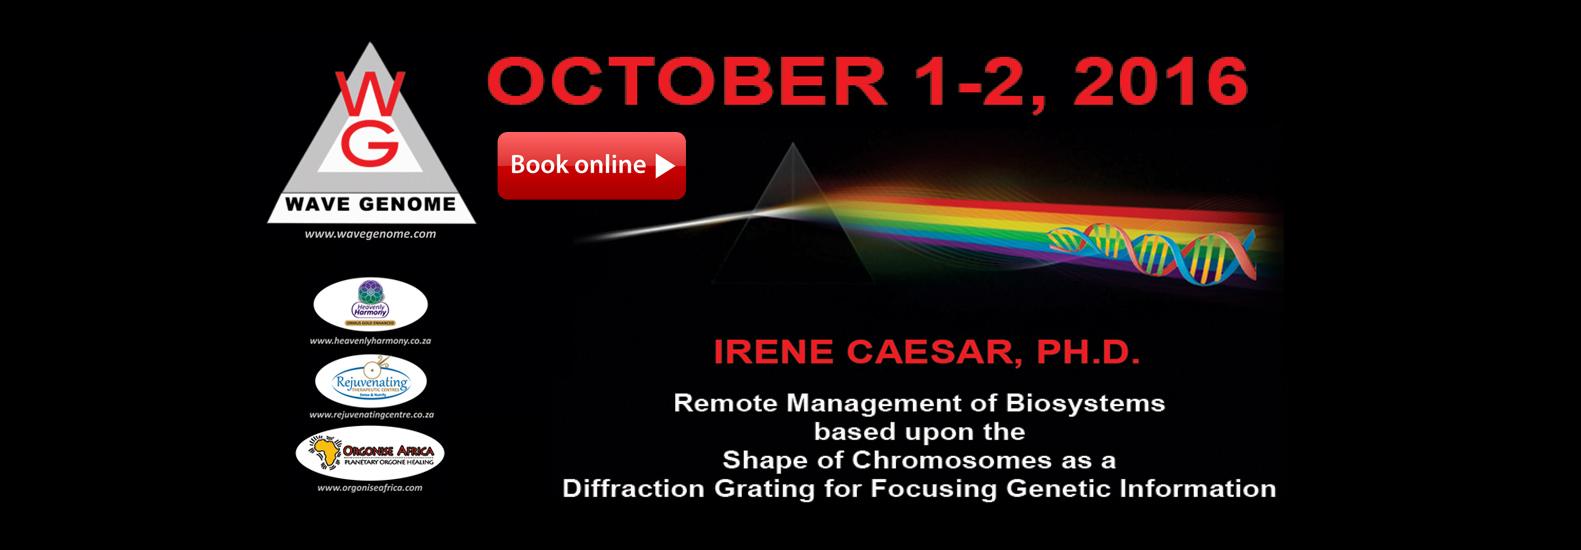 Irene Caesar of Wavegenome